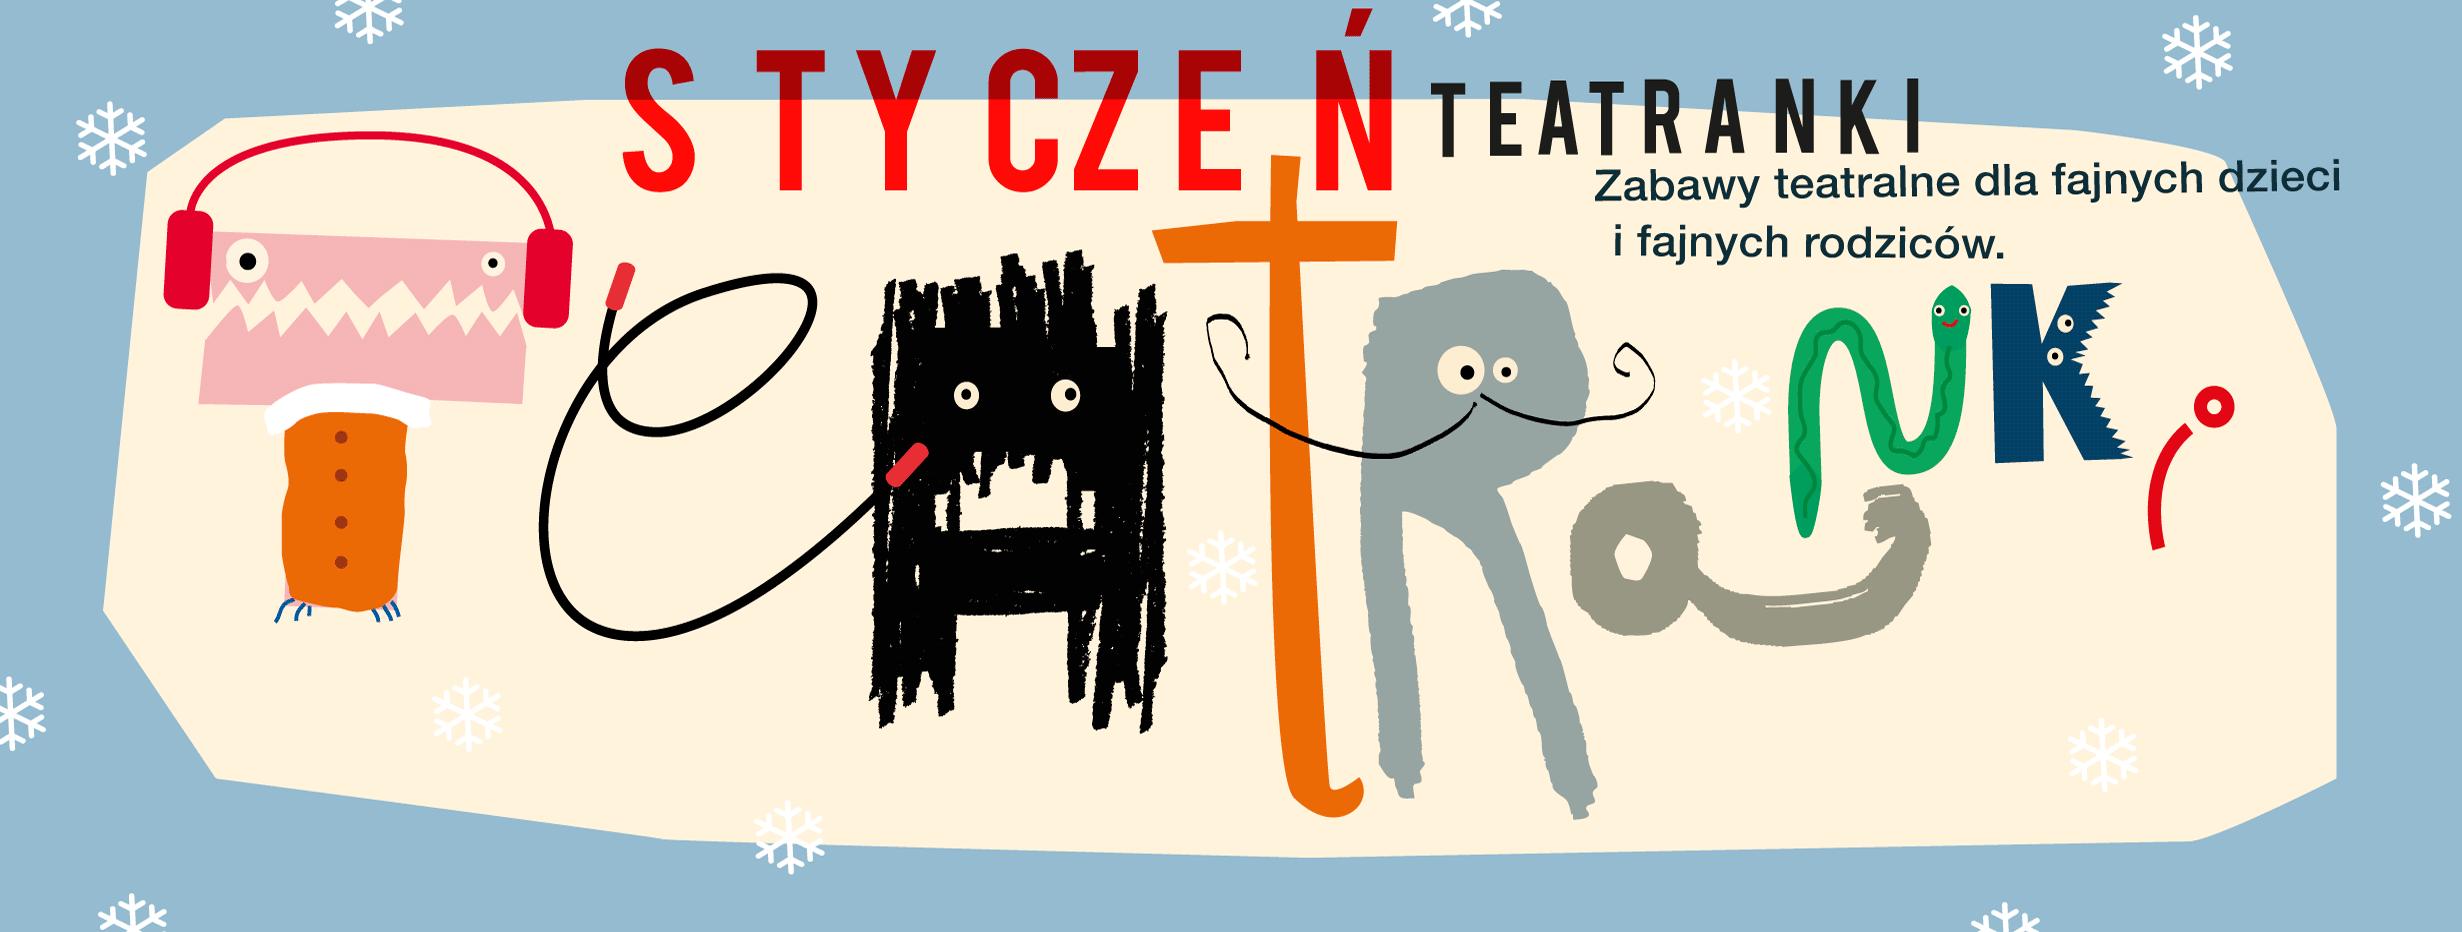 teatranki_styczen_FB